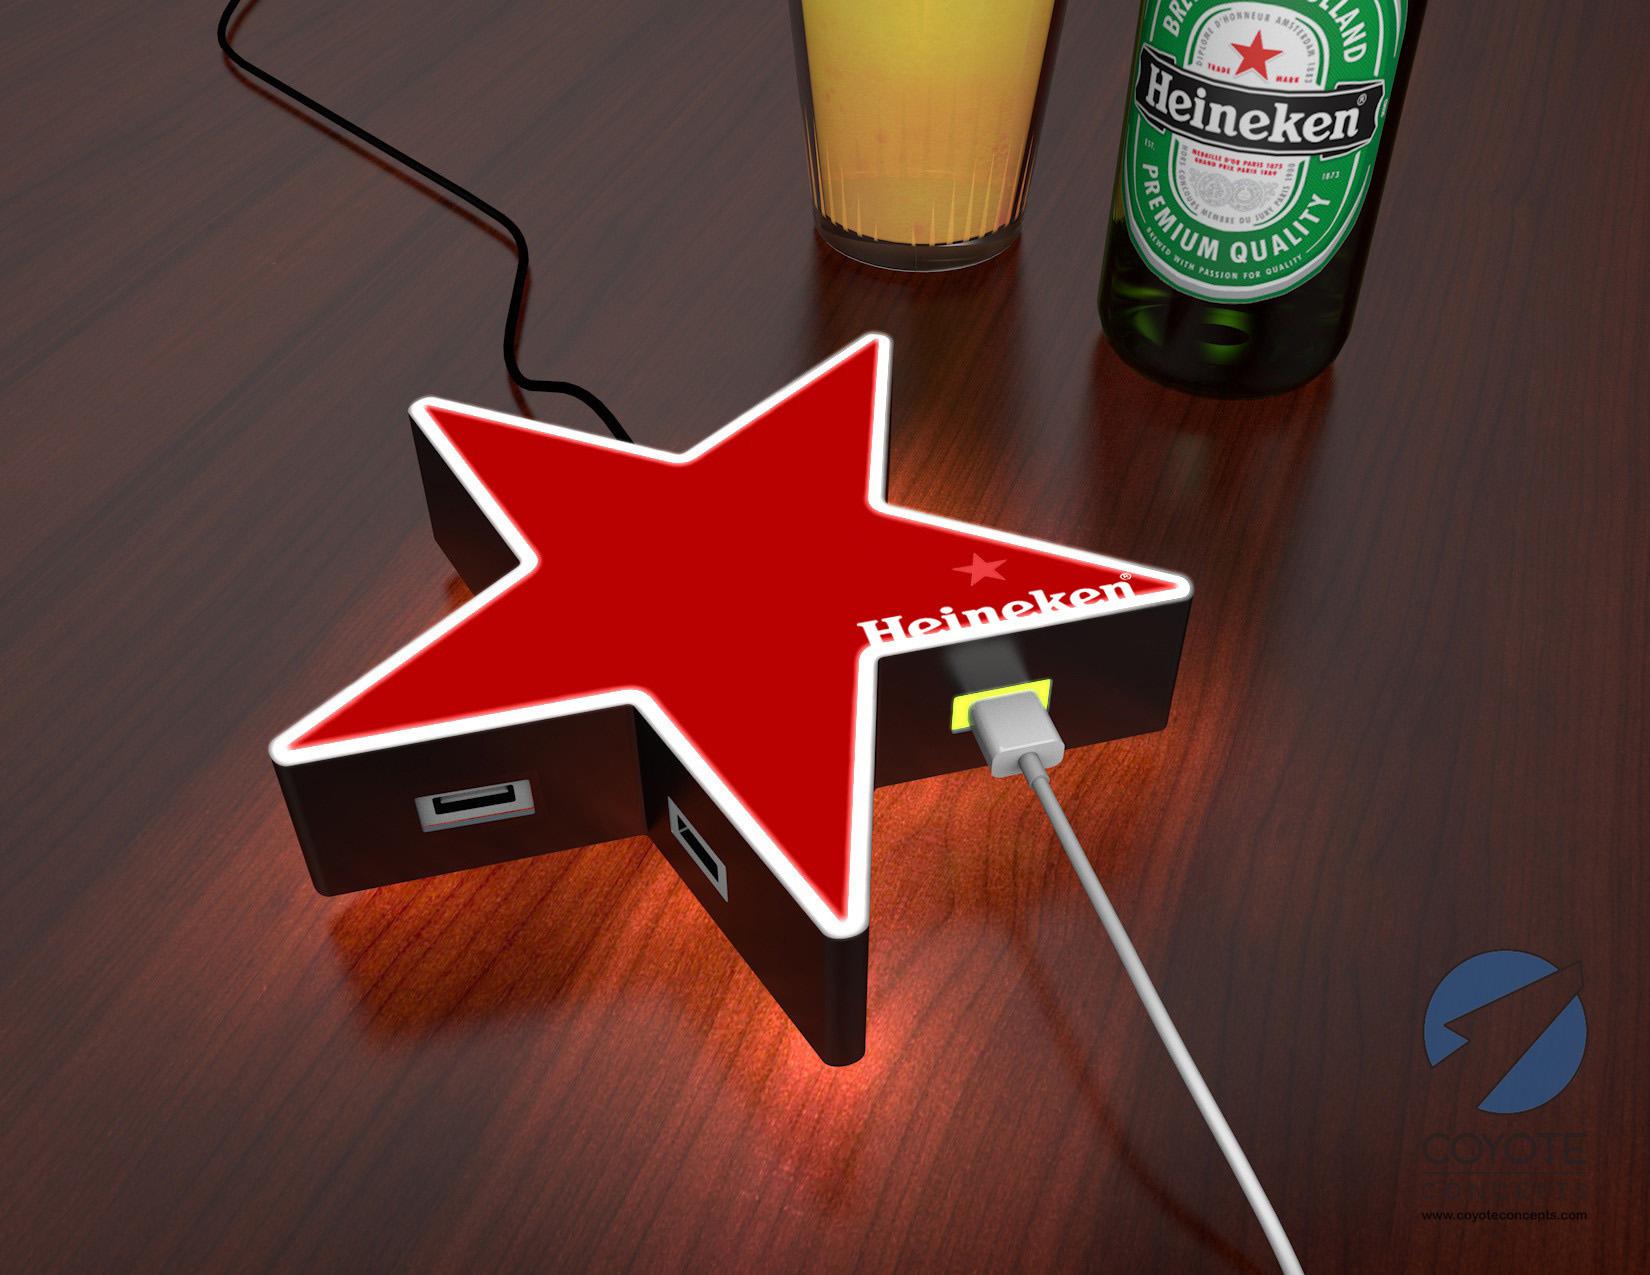 Heineken charging station A.jpg